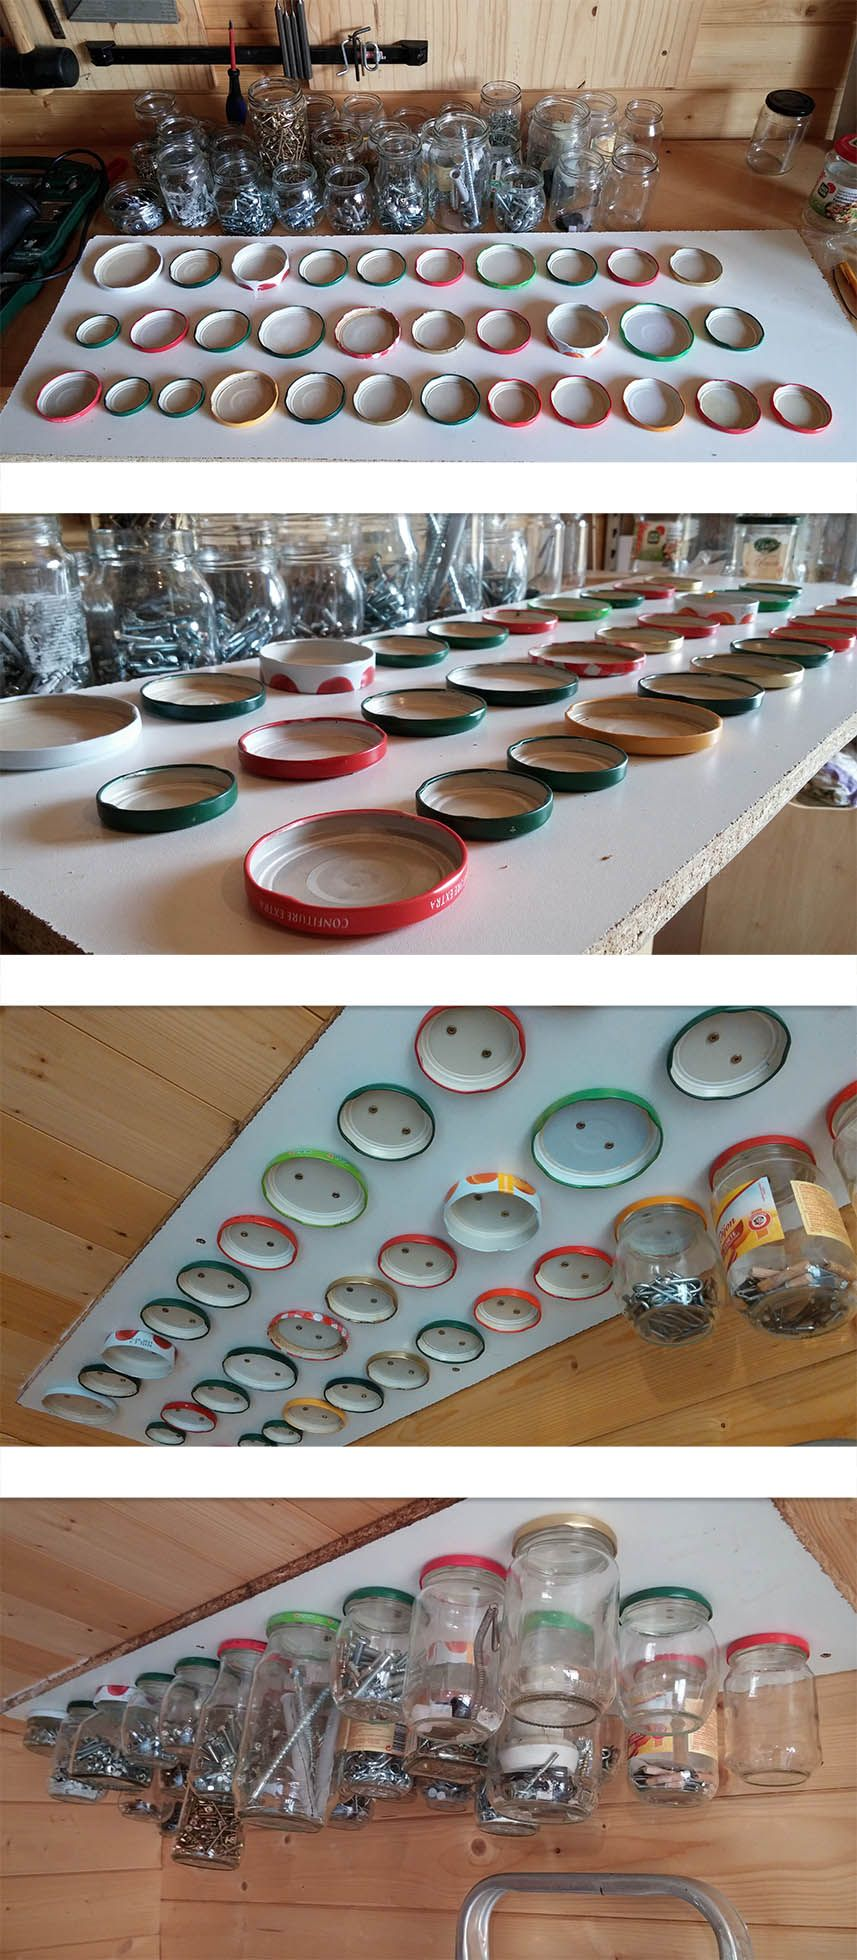 Rangement original pour visserie mes r alisations pinterest rangement originaux et - Astuce rangement atelier bricolage ...